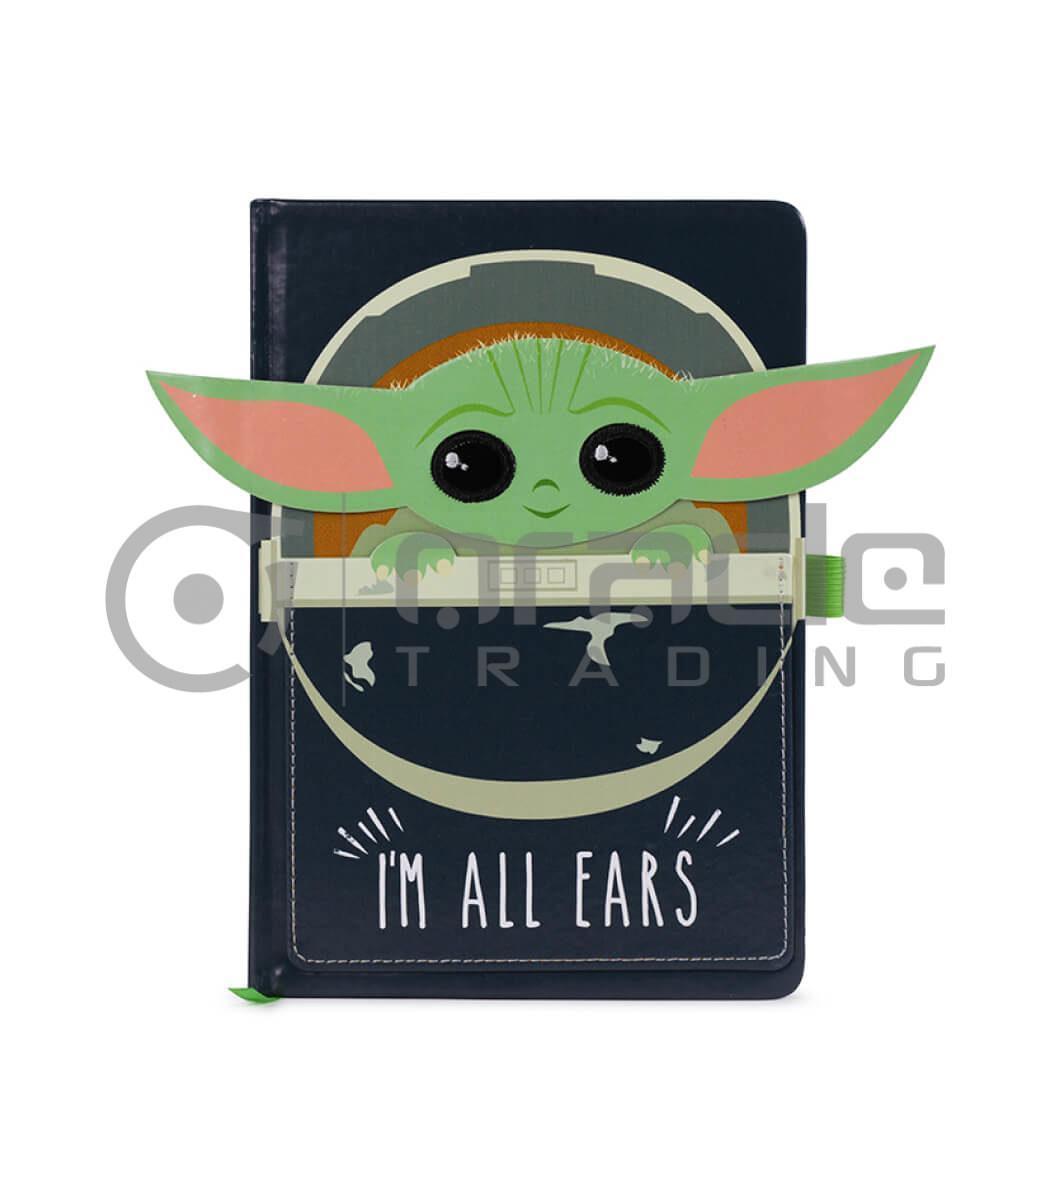 Star Wars: The Mandalorian Notebook - I'm All Ears (Premium)